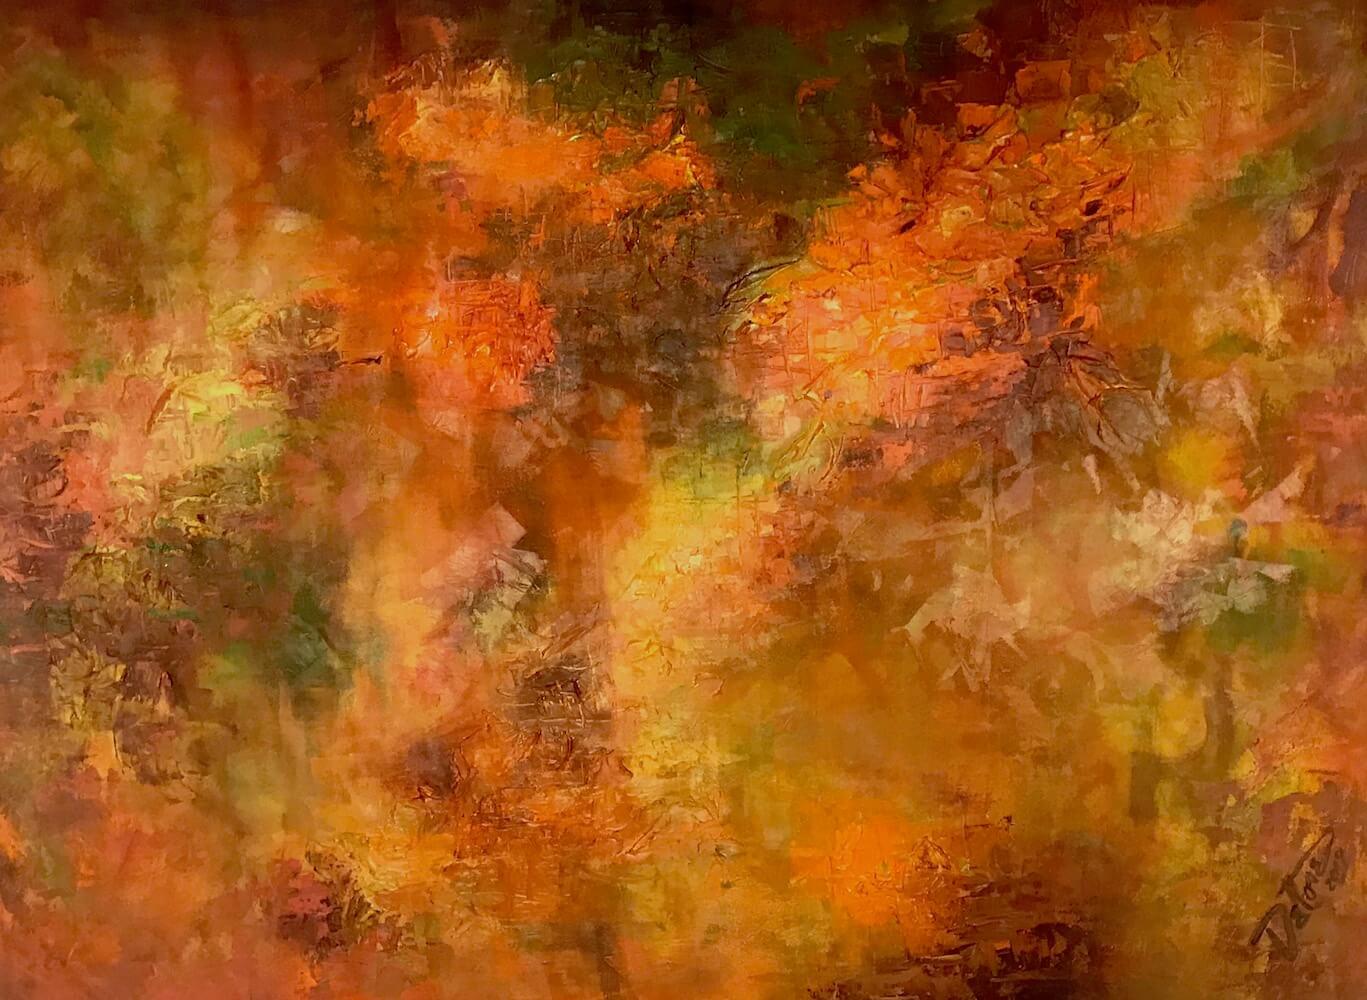 Foliage, acrylic on canvas 84 x 60